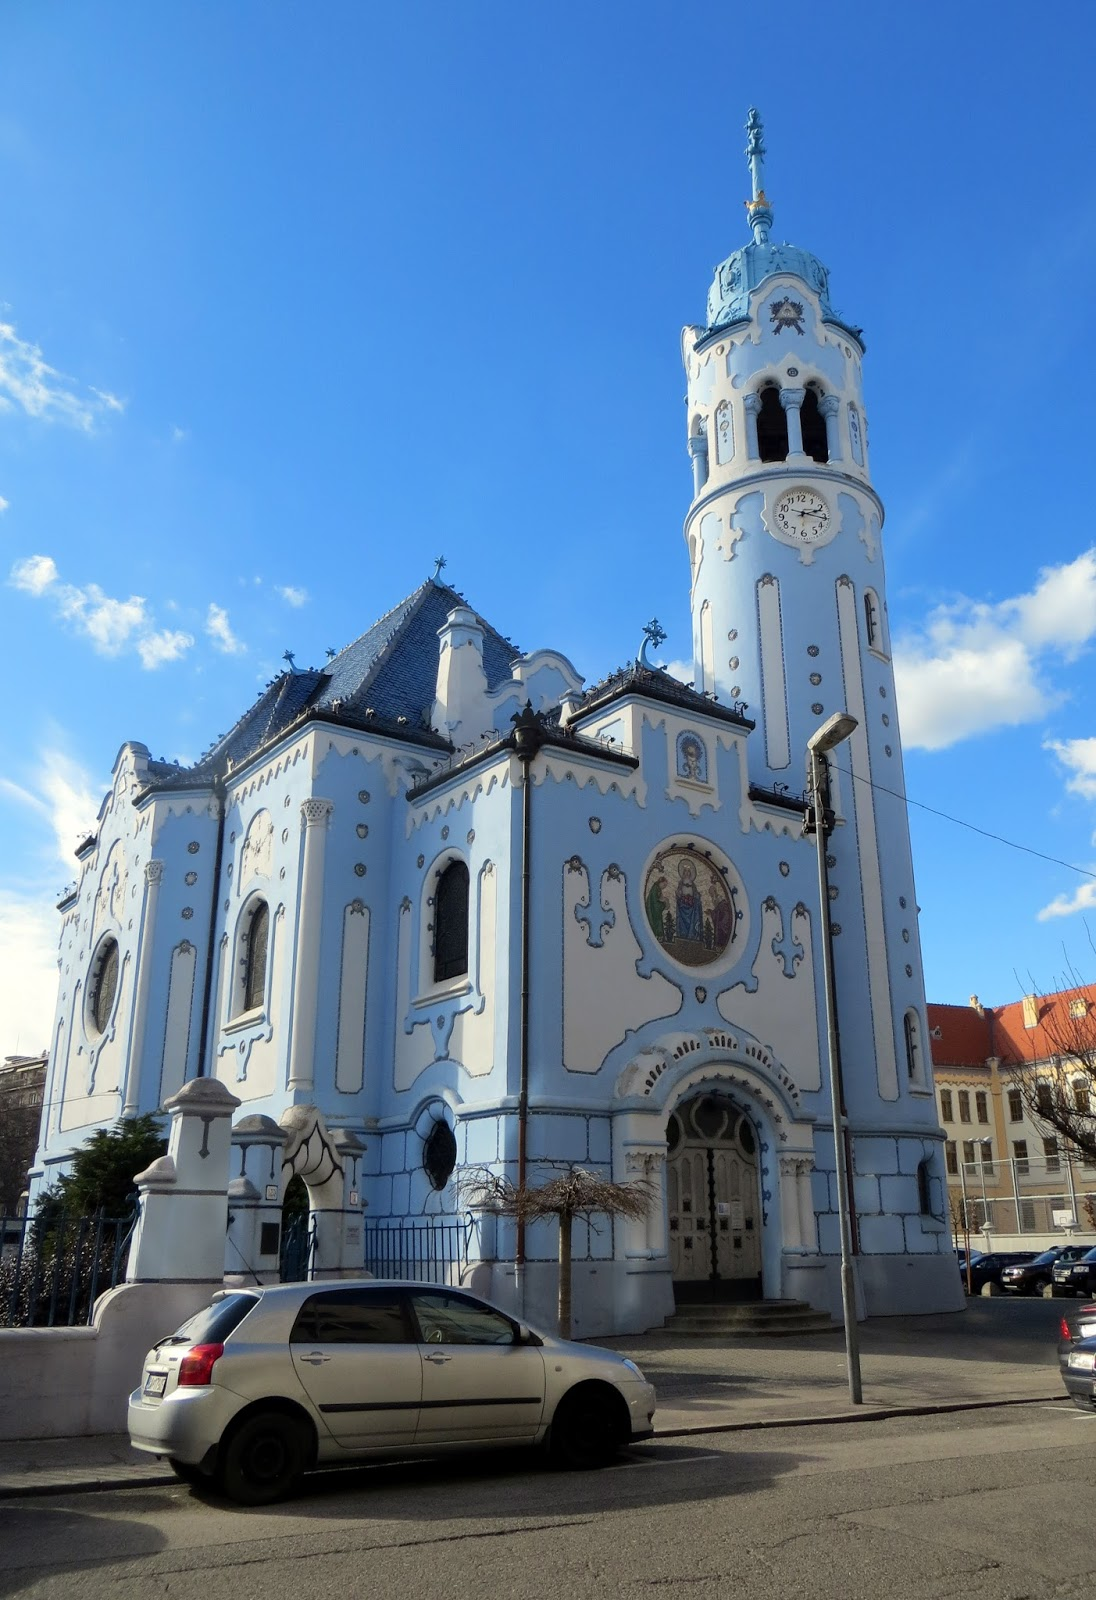 Slovakia, Bratislava, off the beaten track, eastern europe, eu, historical city, on the danube, ufo, bridge, communist, blue church